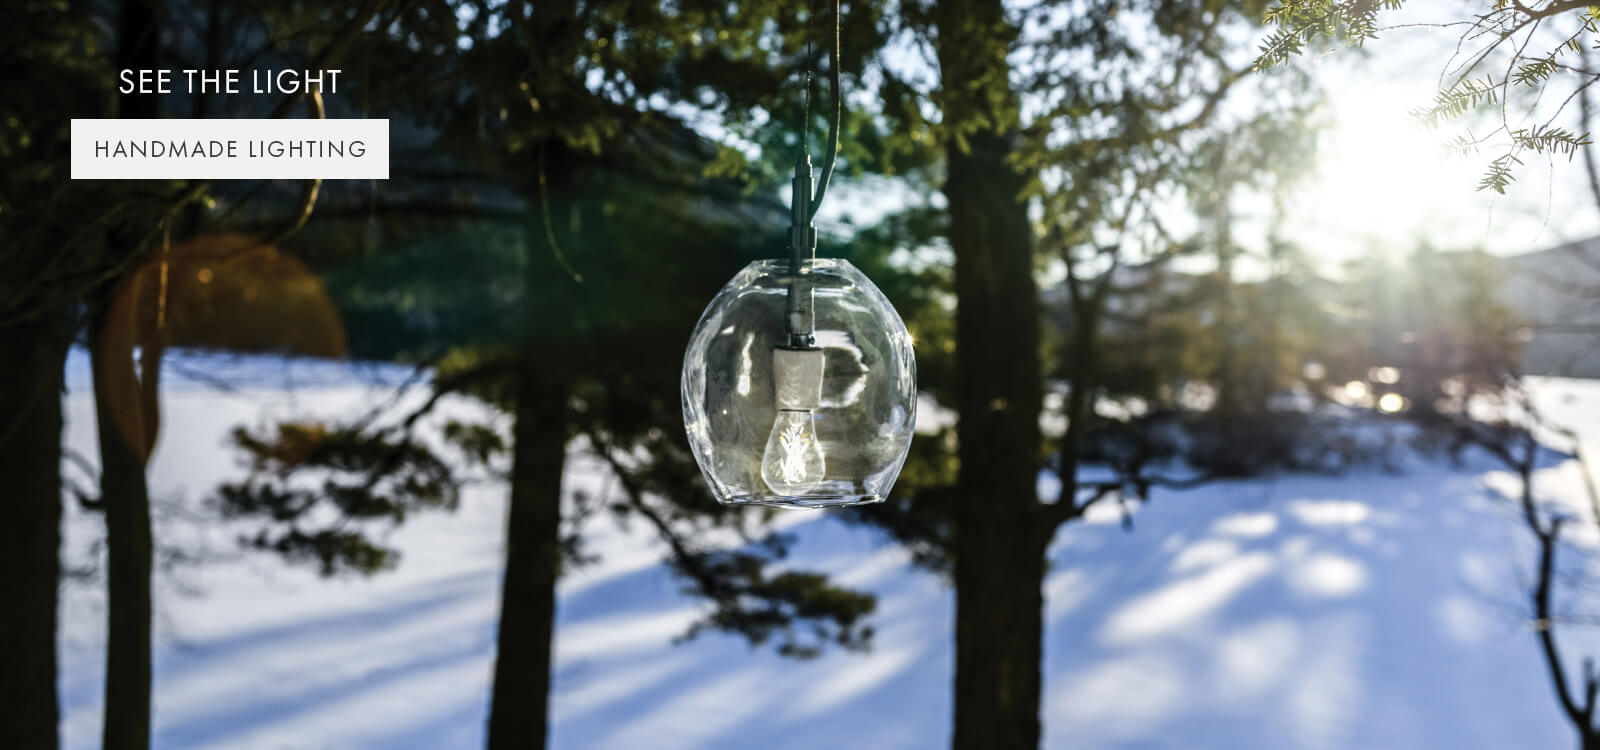 SEE THE LIGHT — HANDMADE LIGHTING >